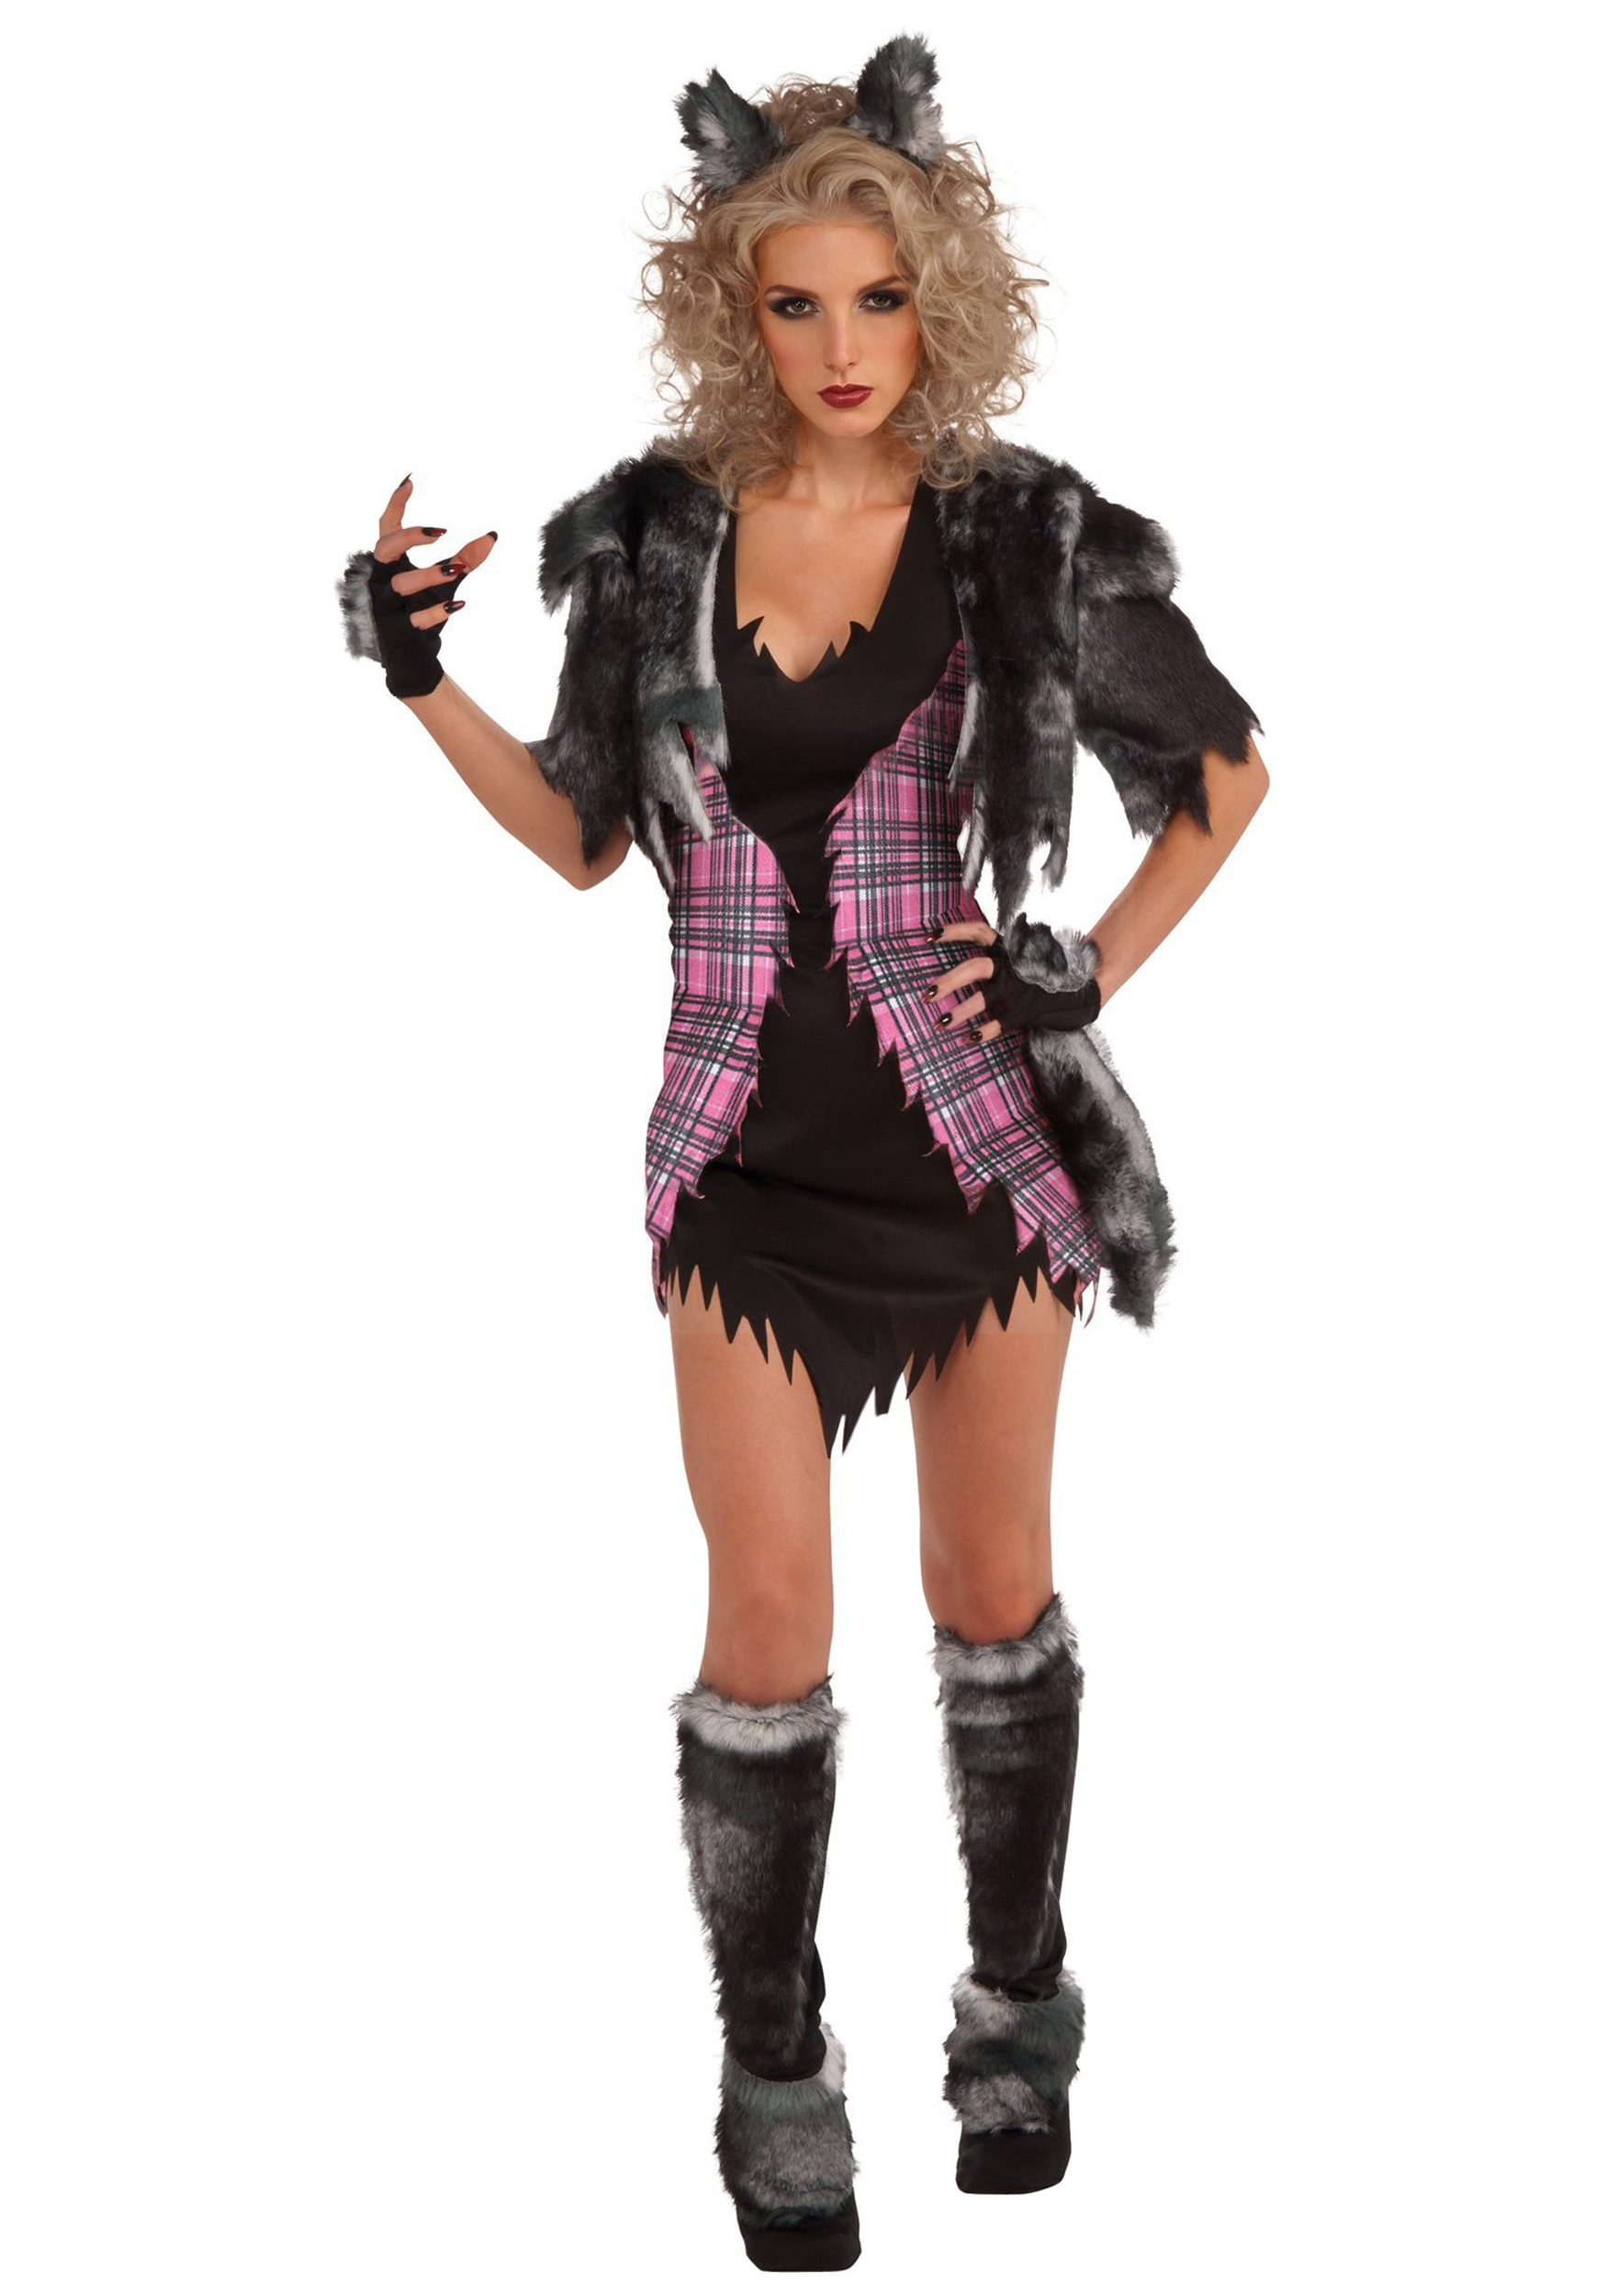 Naughty She Wolf Costume  sc 1 st  Halloween Costume & Naughty She Wolf Costume - Womens Werewolf Costume Ideas